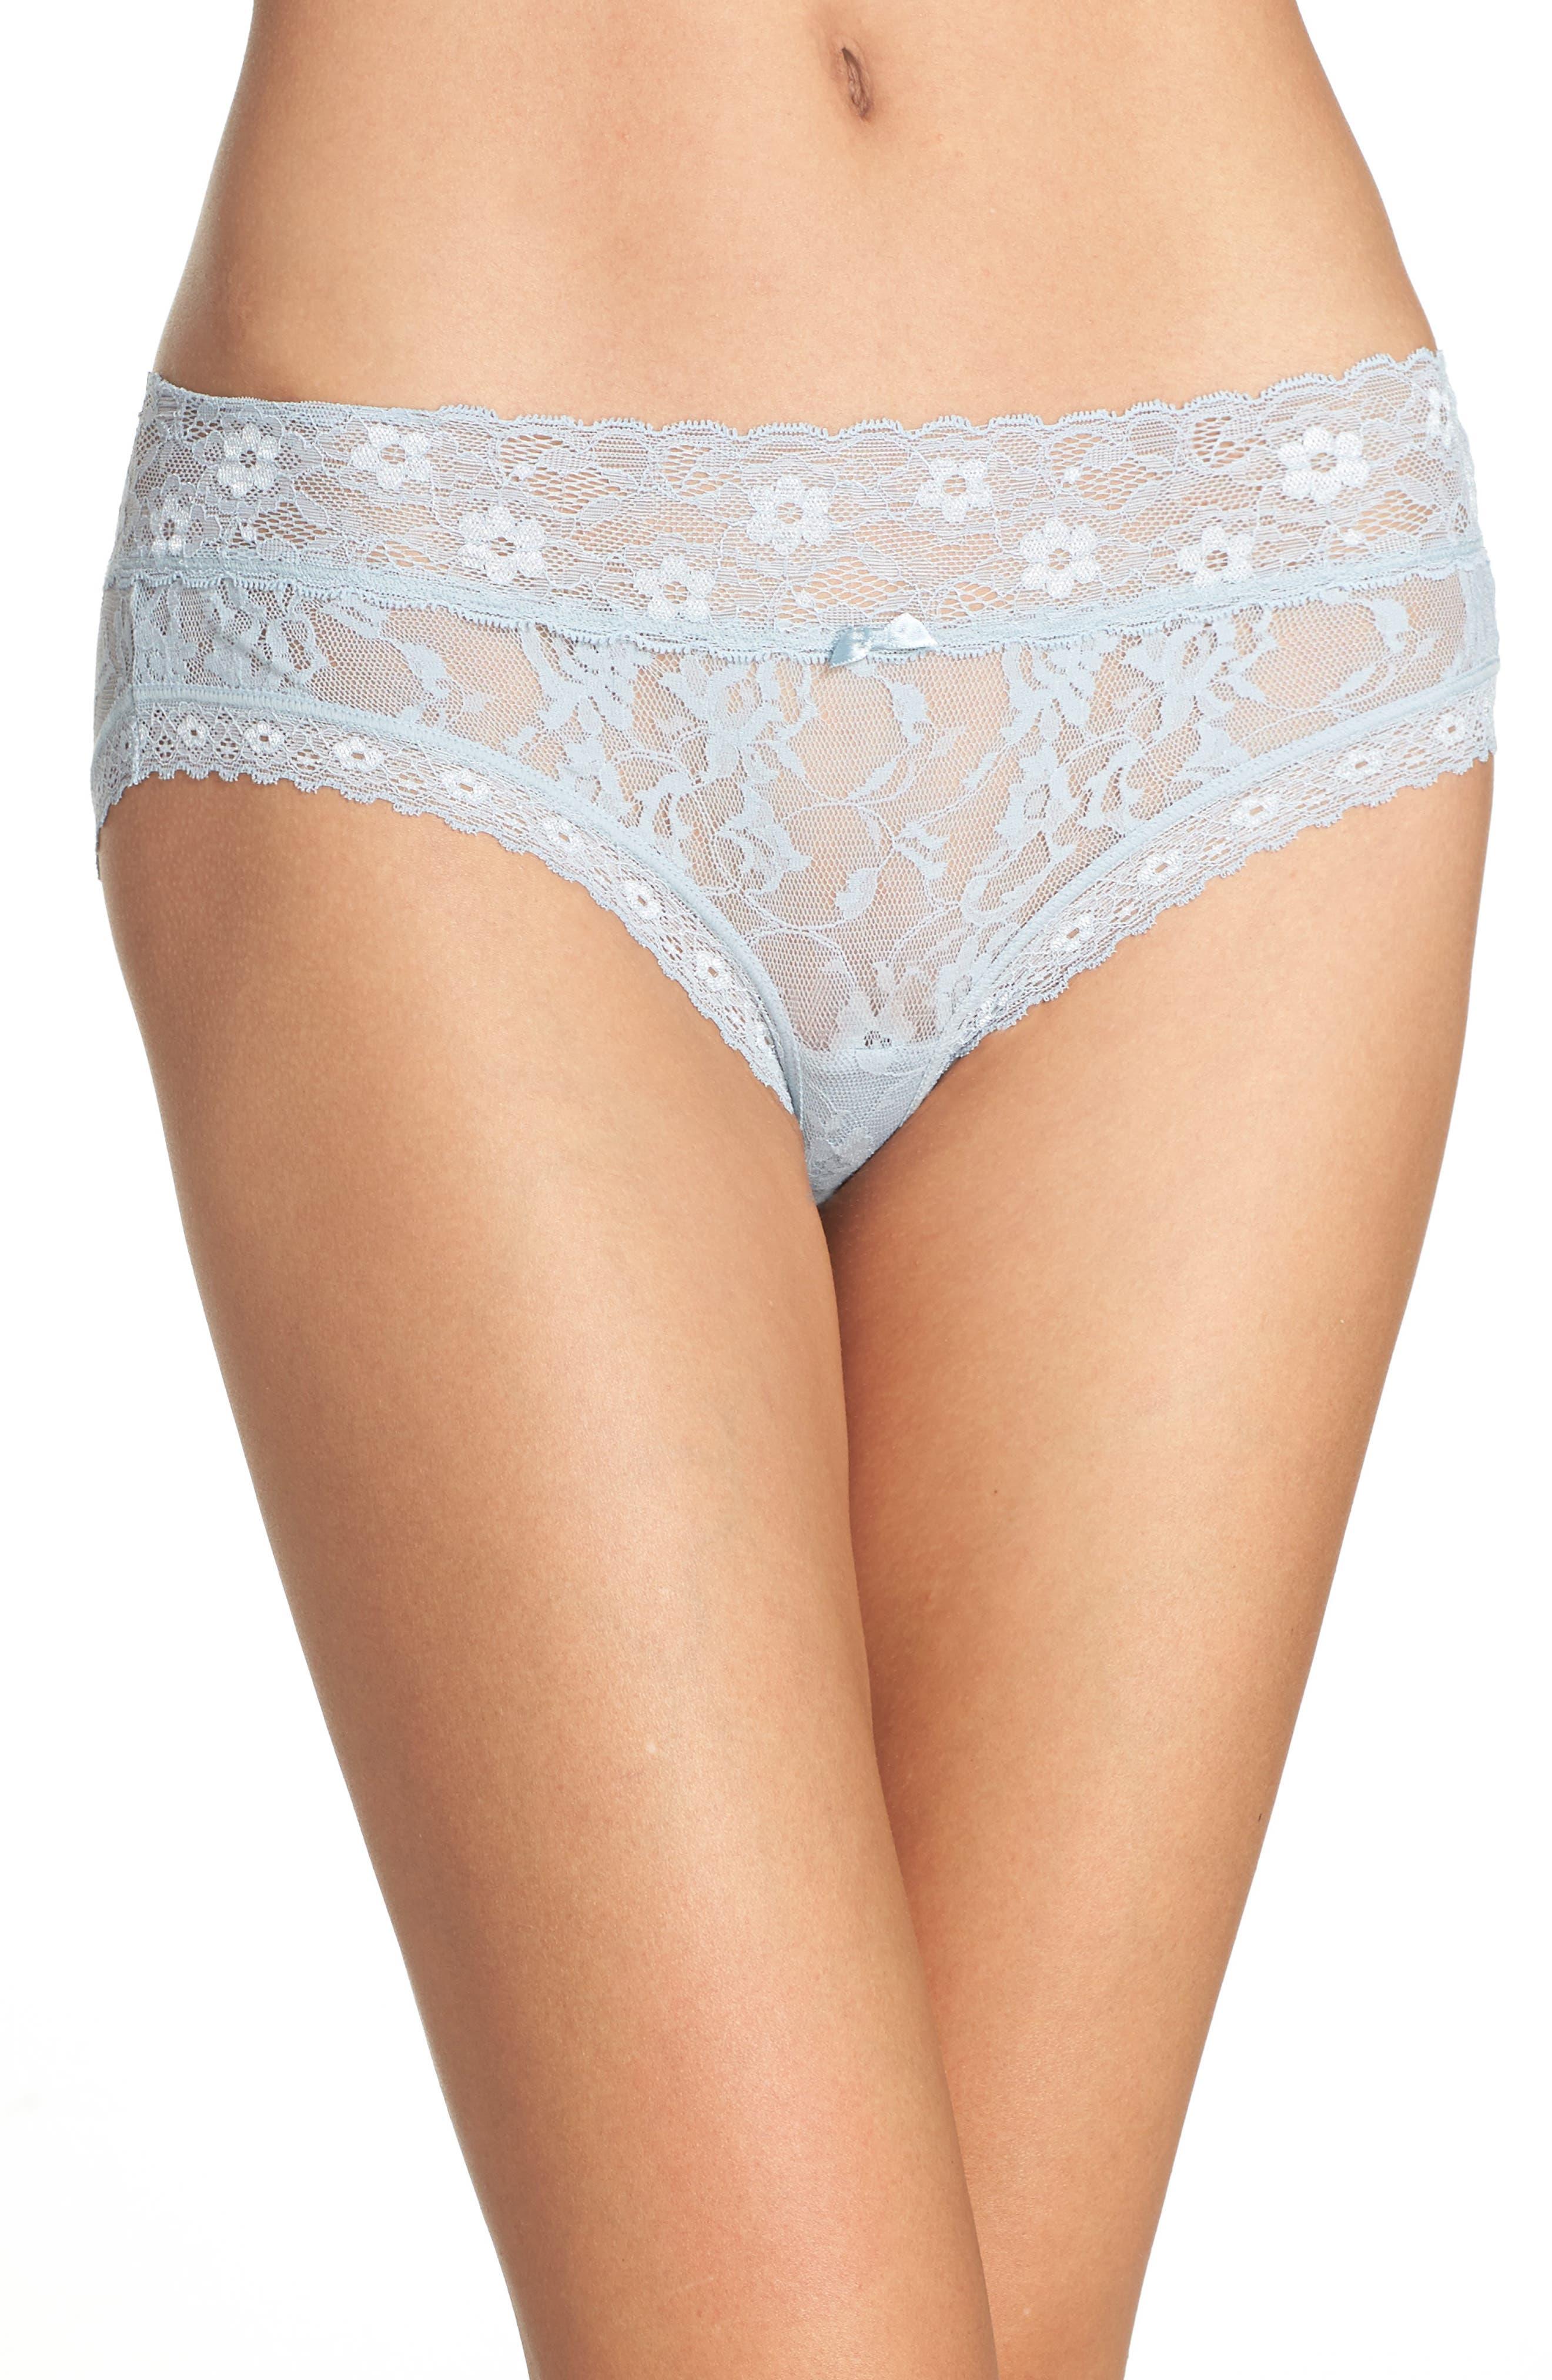 Alternate Image 1 Selected - DKNY 'Signature Lace' Bikini (3 for $30)